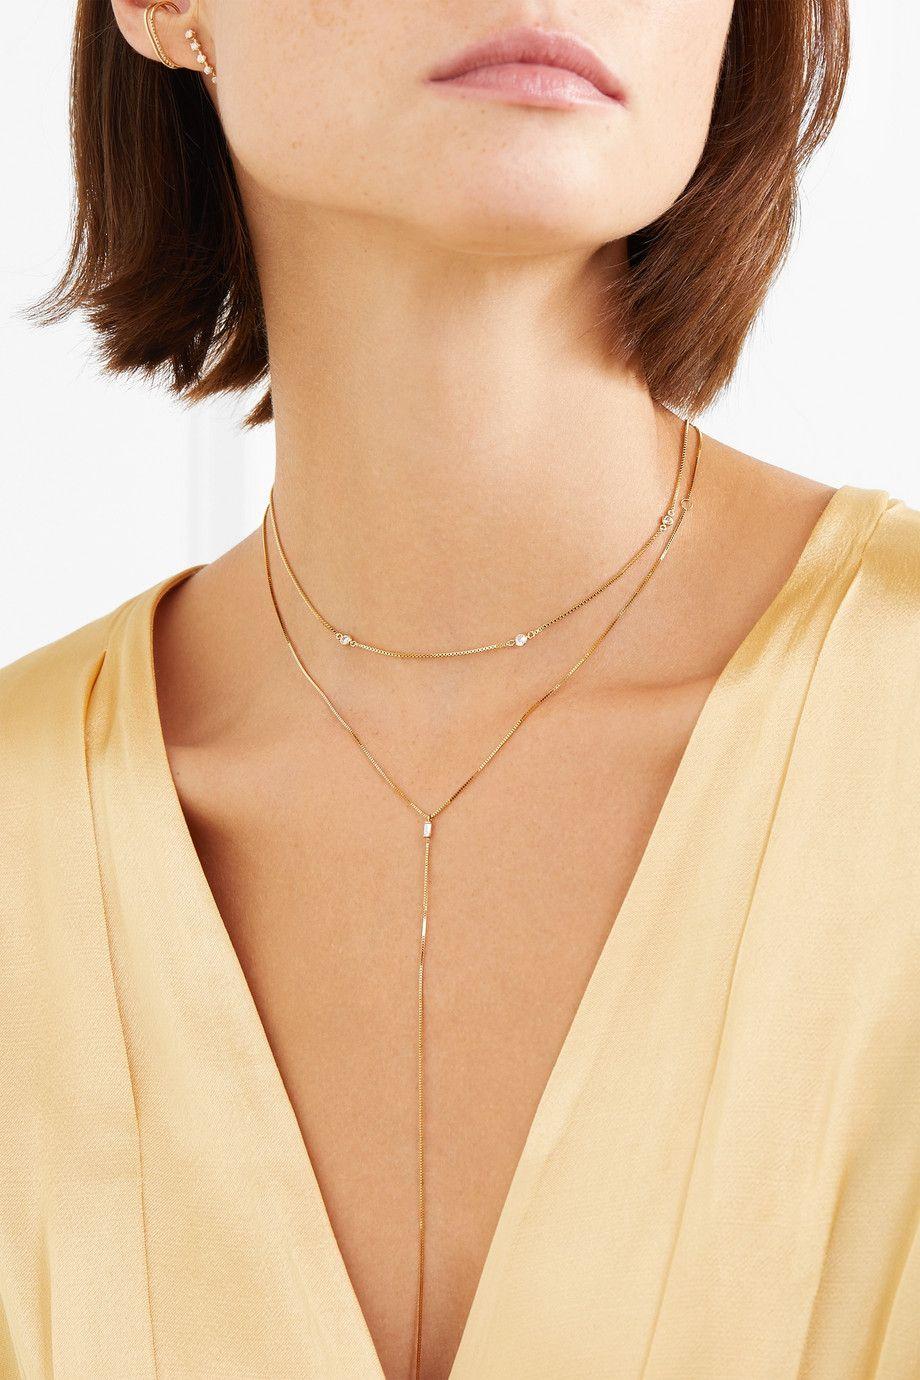 Loren Stewart Fairy Floss 9-karat Gold Diamond Choker Y3rWFjTV3Y